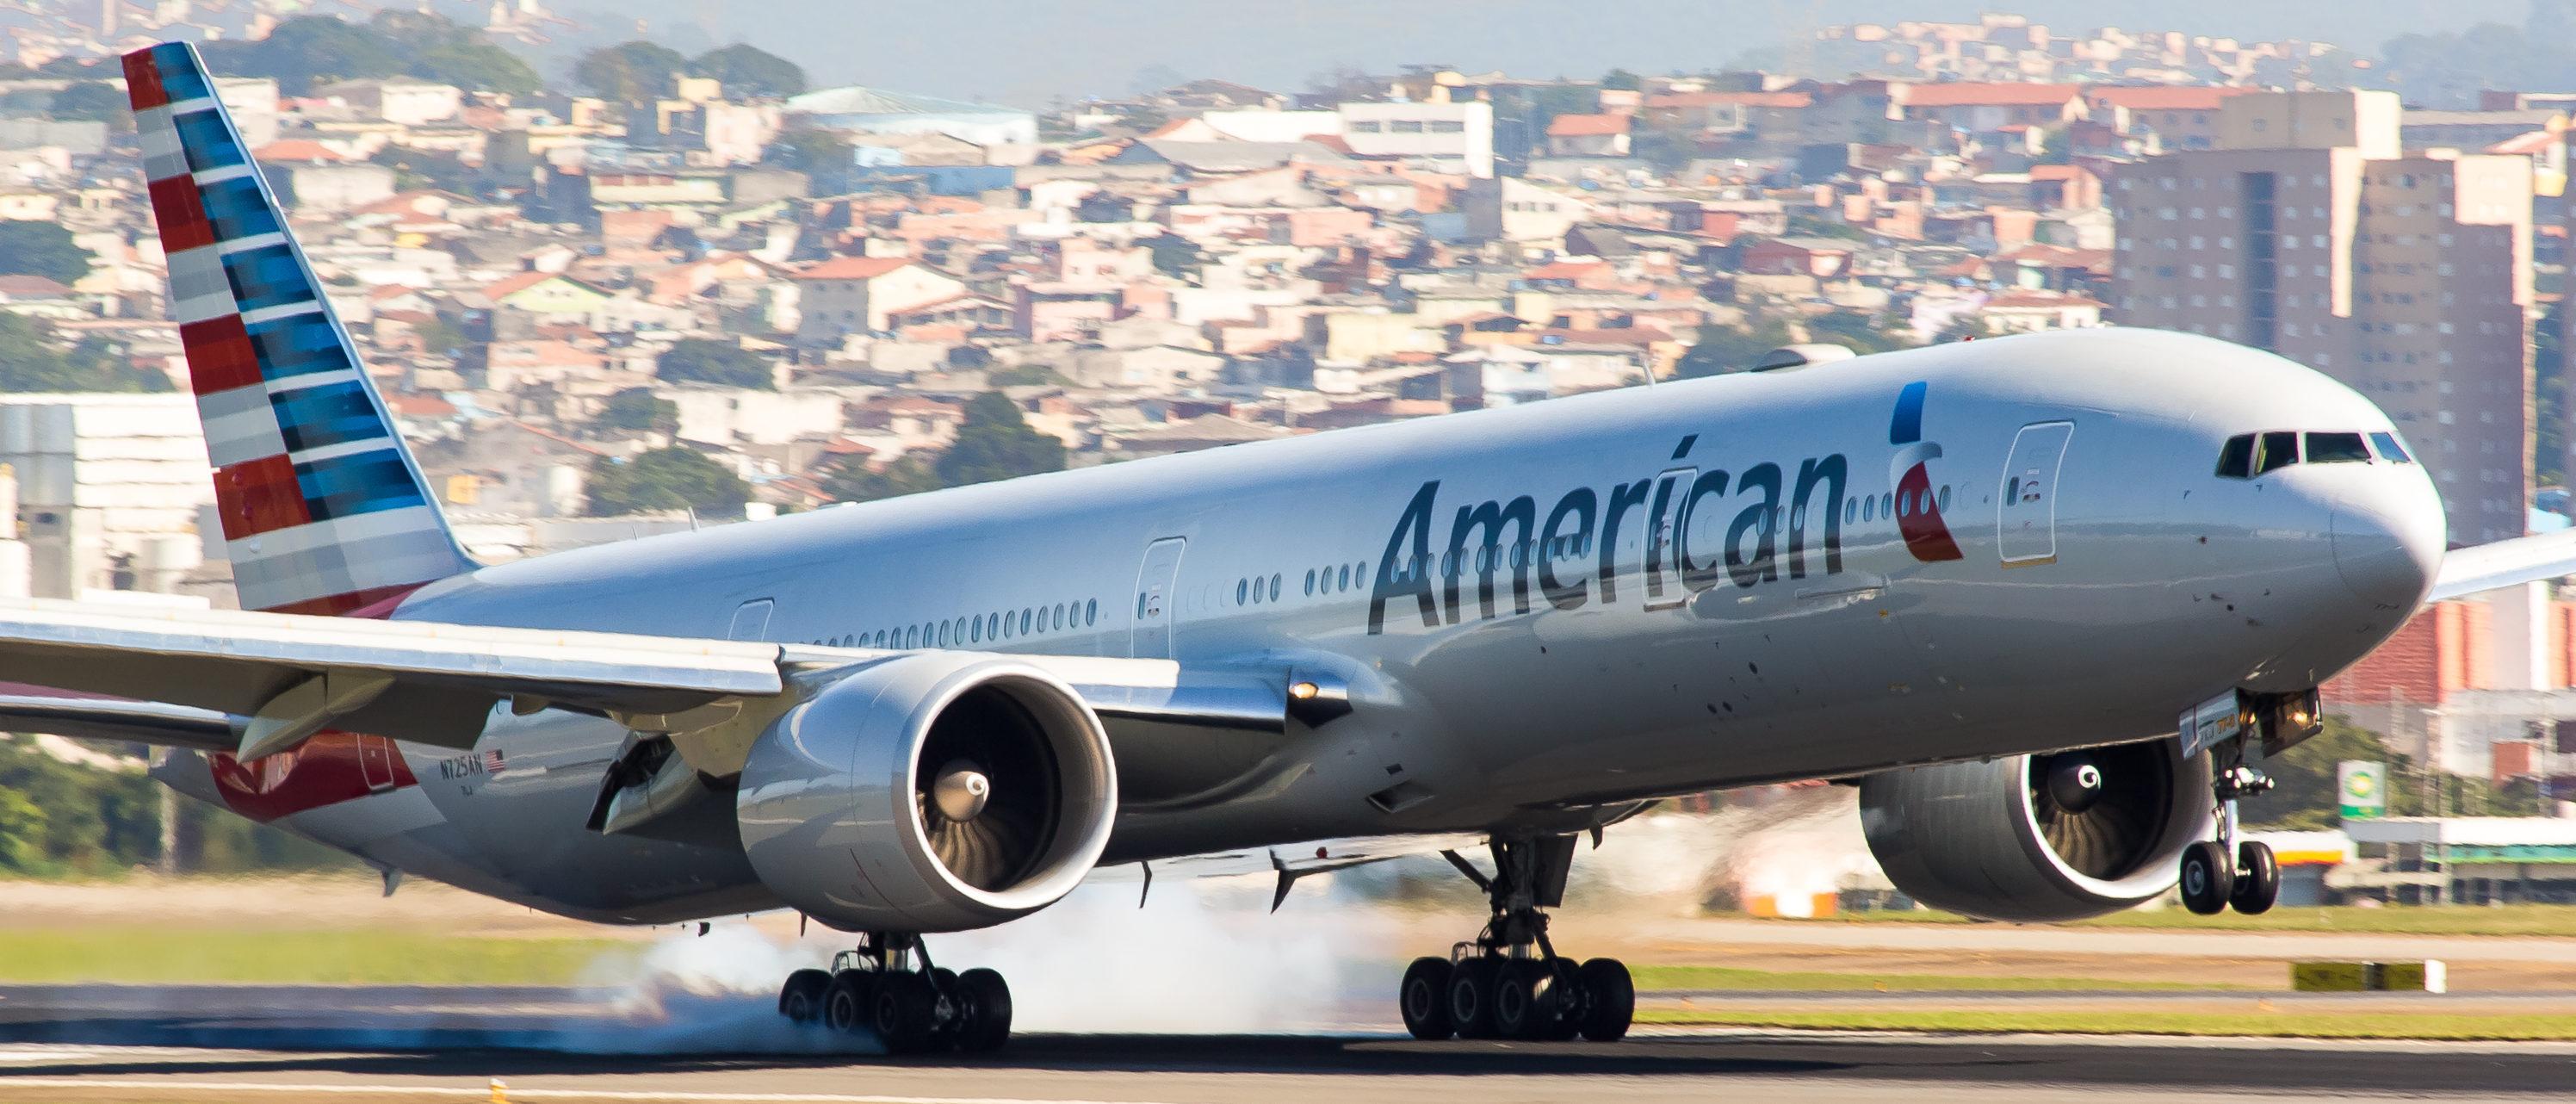 American Airlines 777 plane, Gru Airport (Shutterstock/Edu Perez)